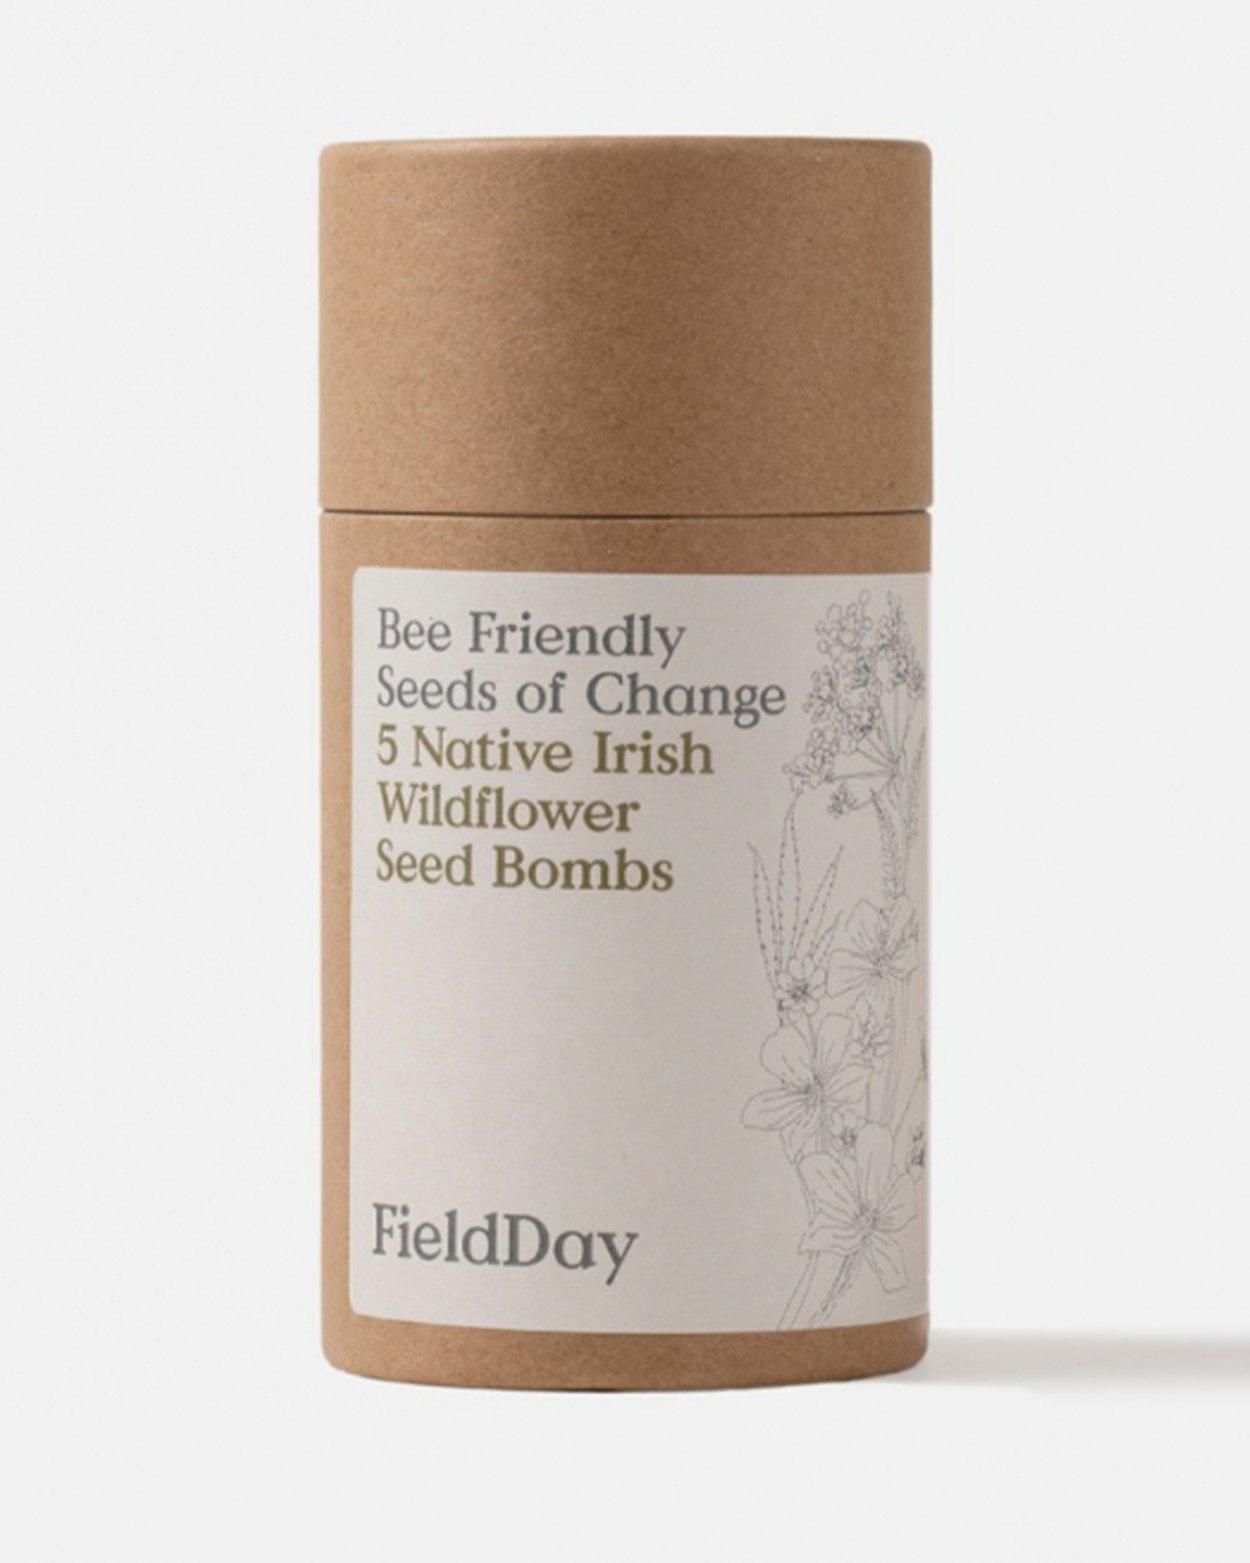 Seeds of Change - Five Bee Friendly Wildflower Bombs